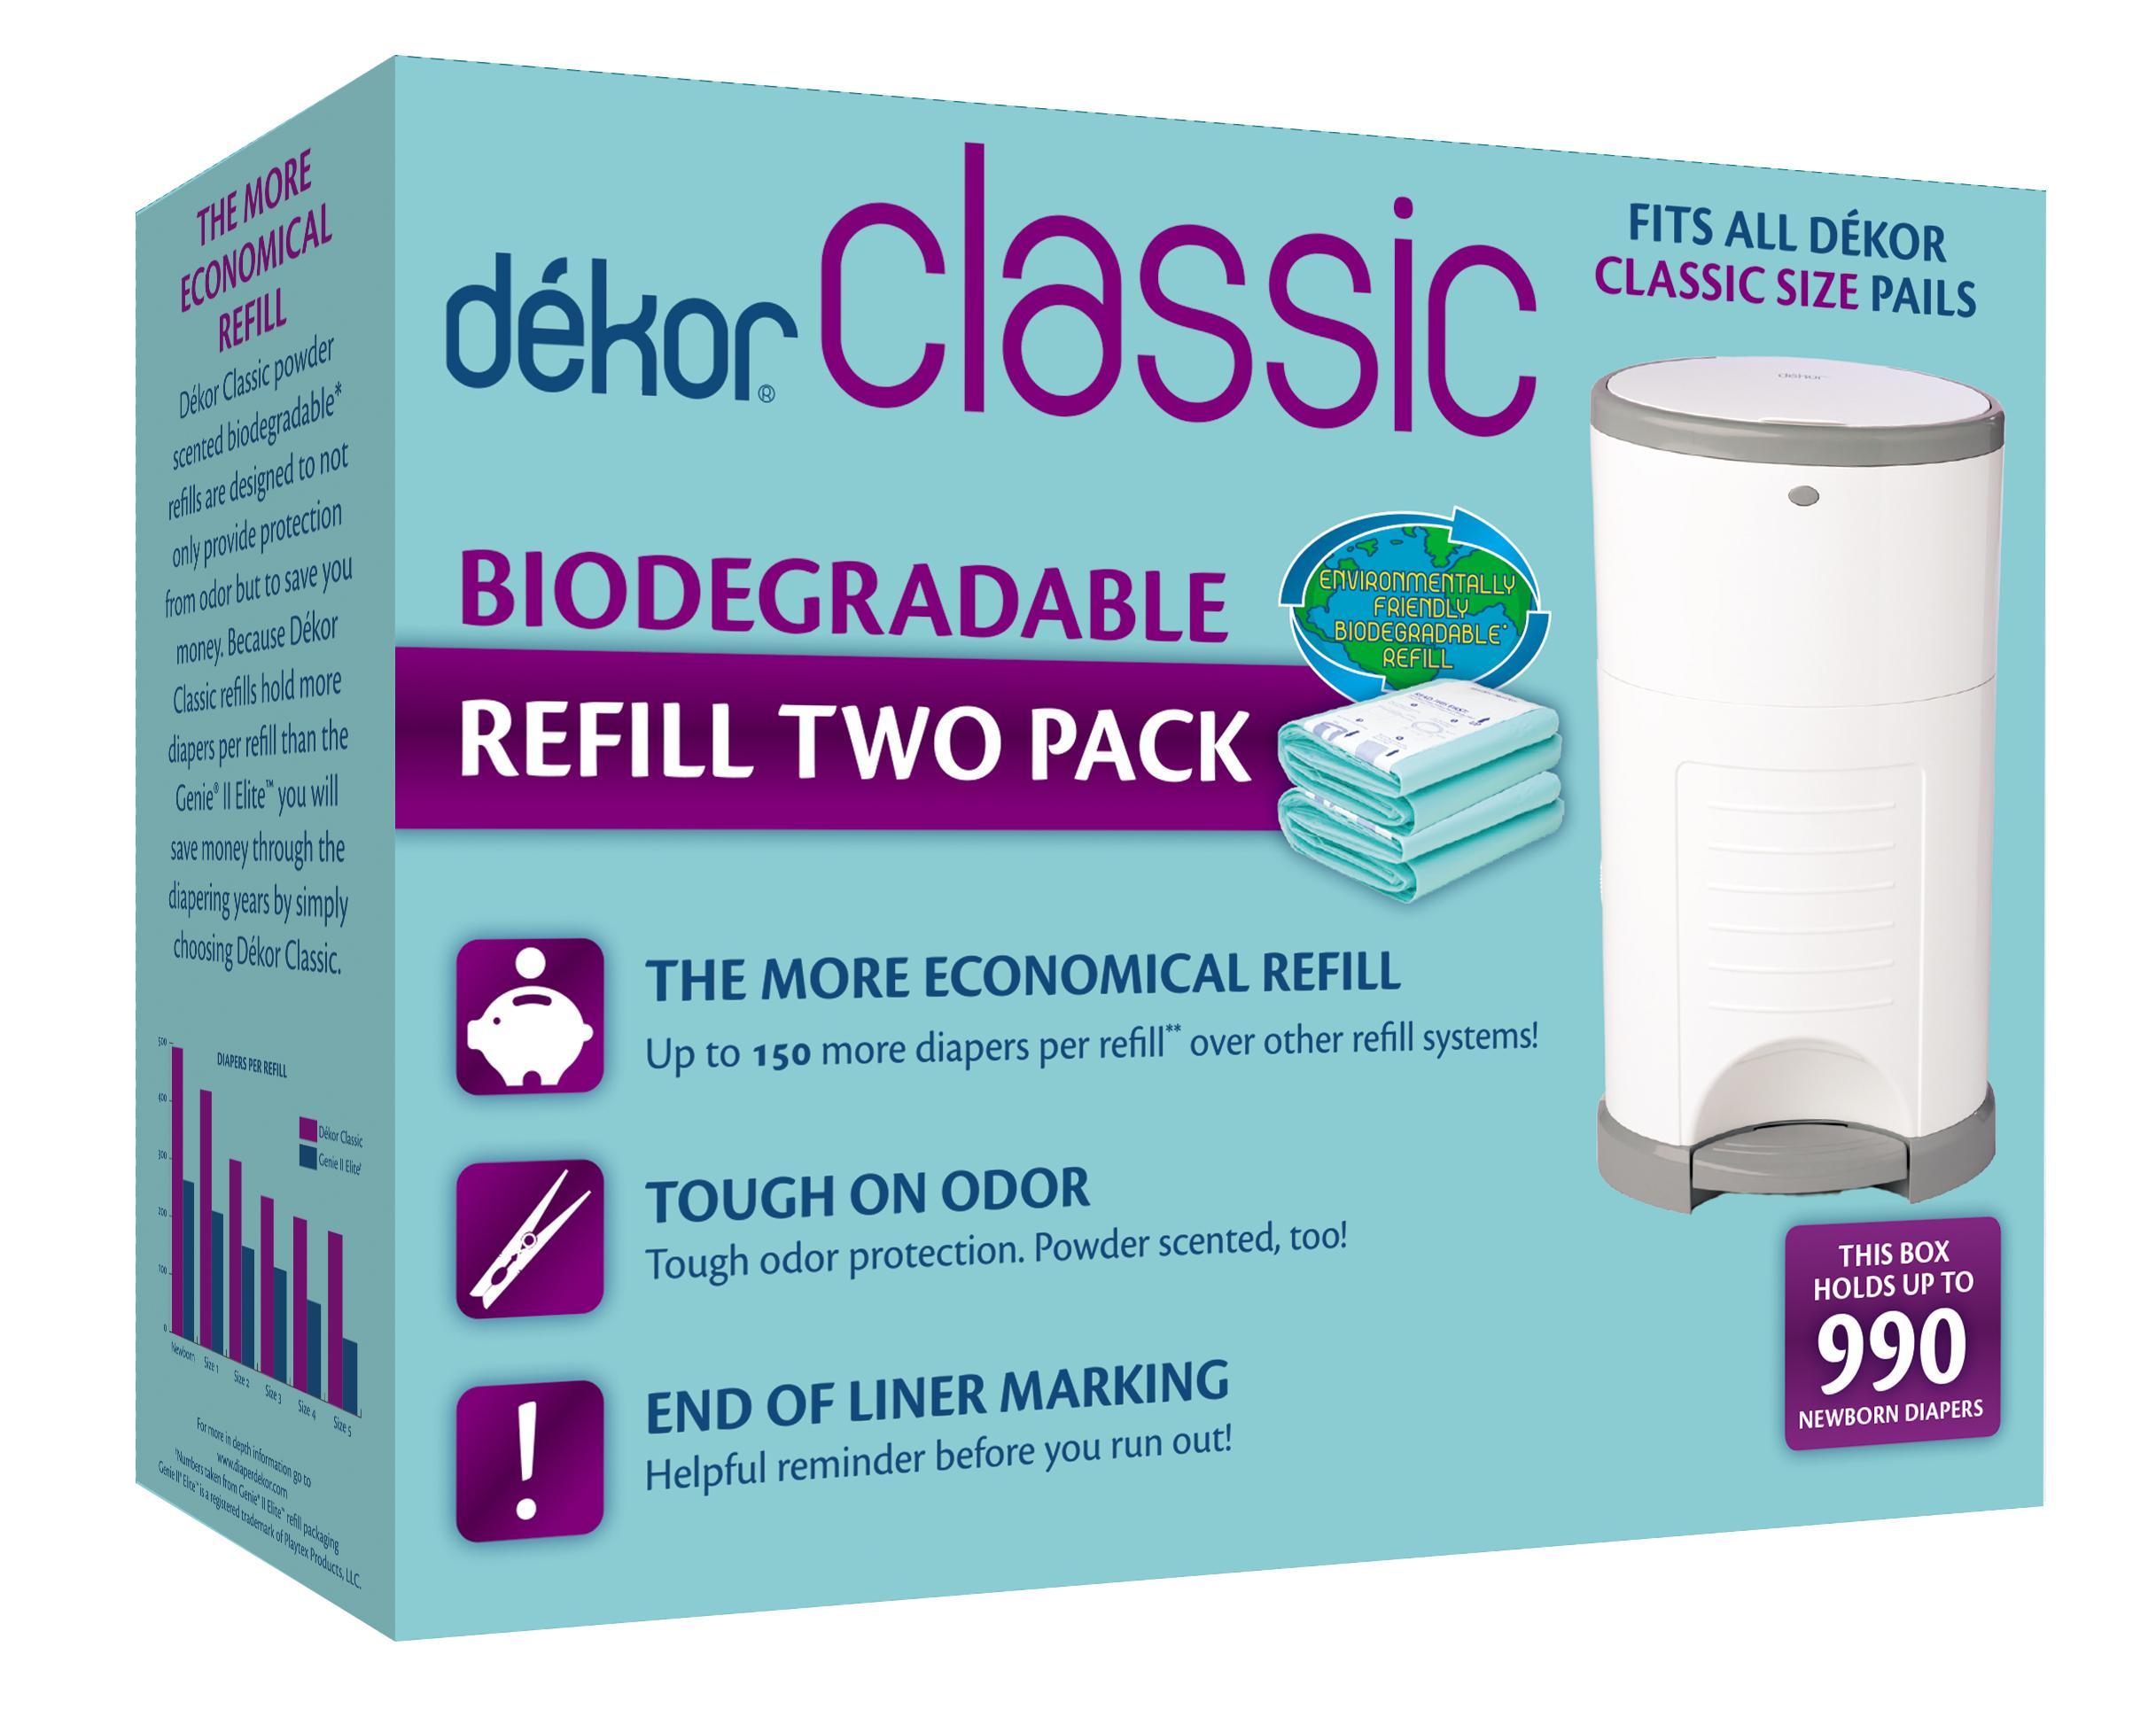 Diaper dekor classic diaper pail liner for Dekor classic diaper pail refills